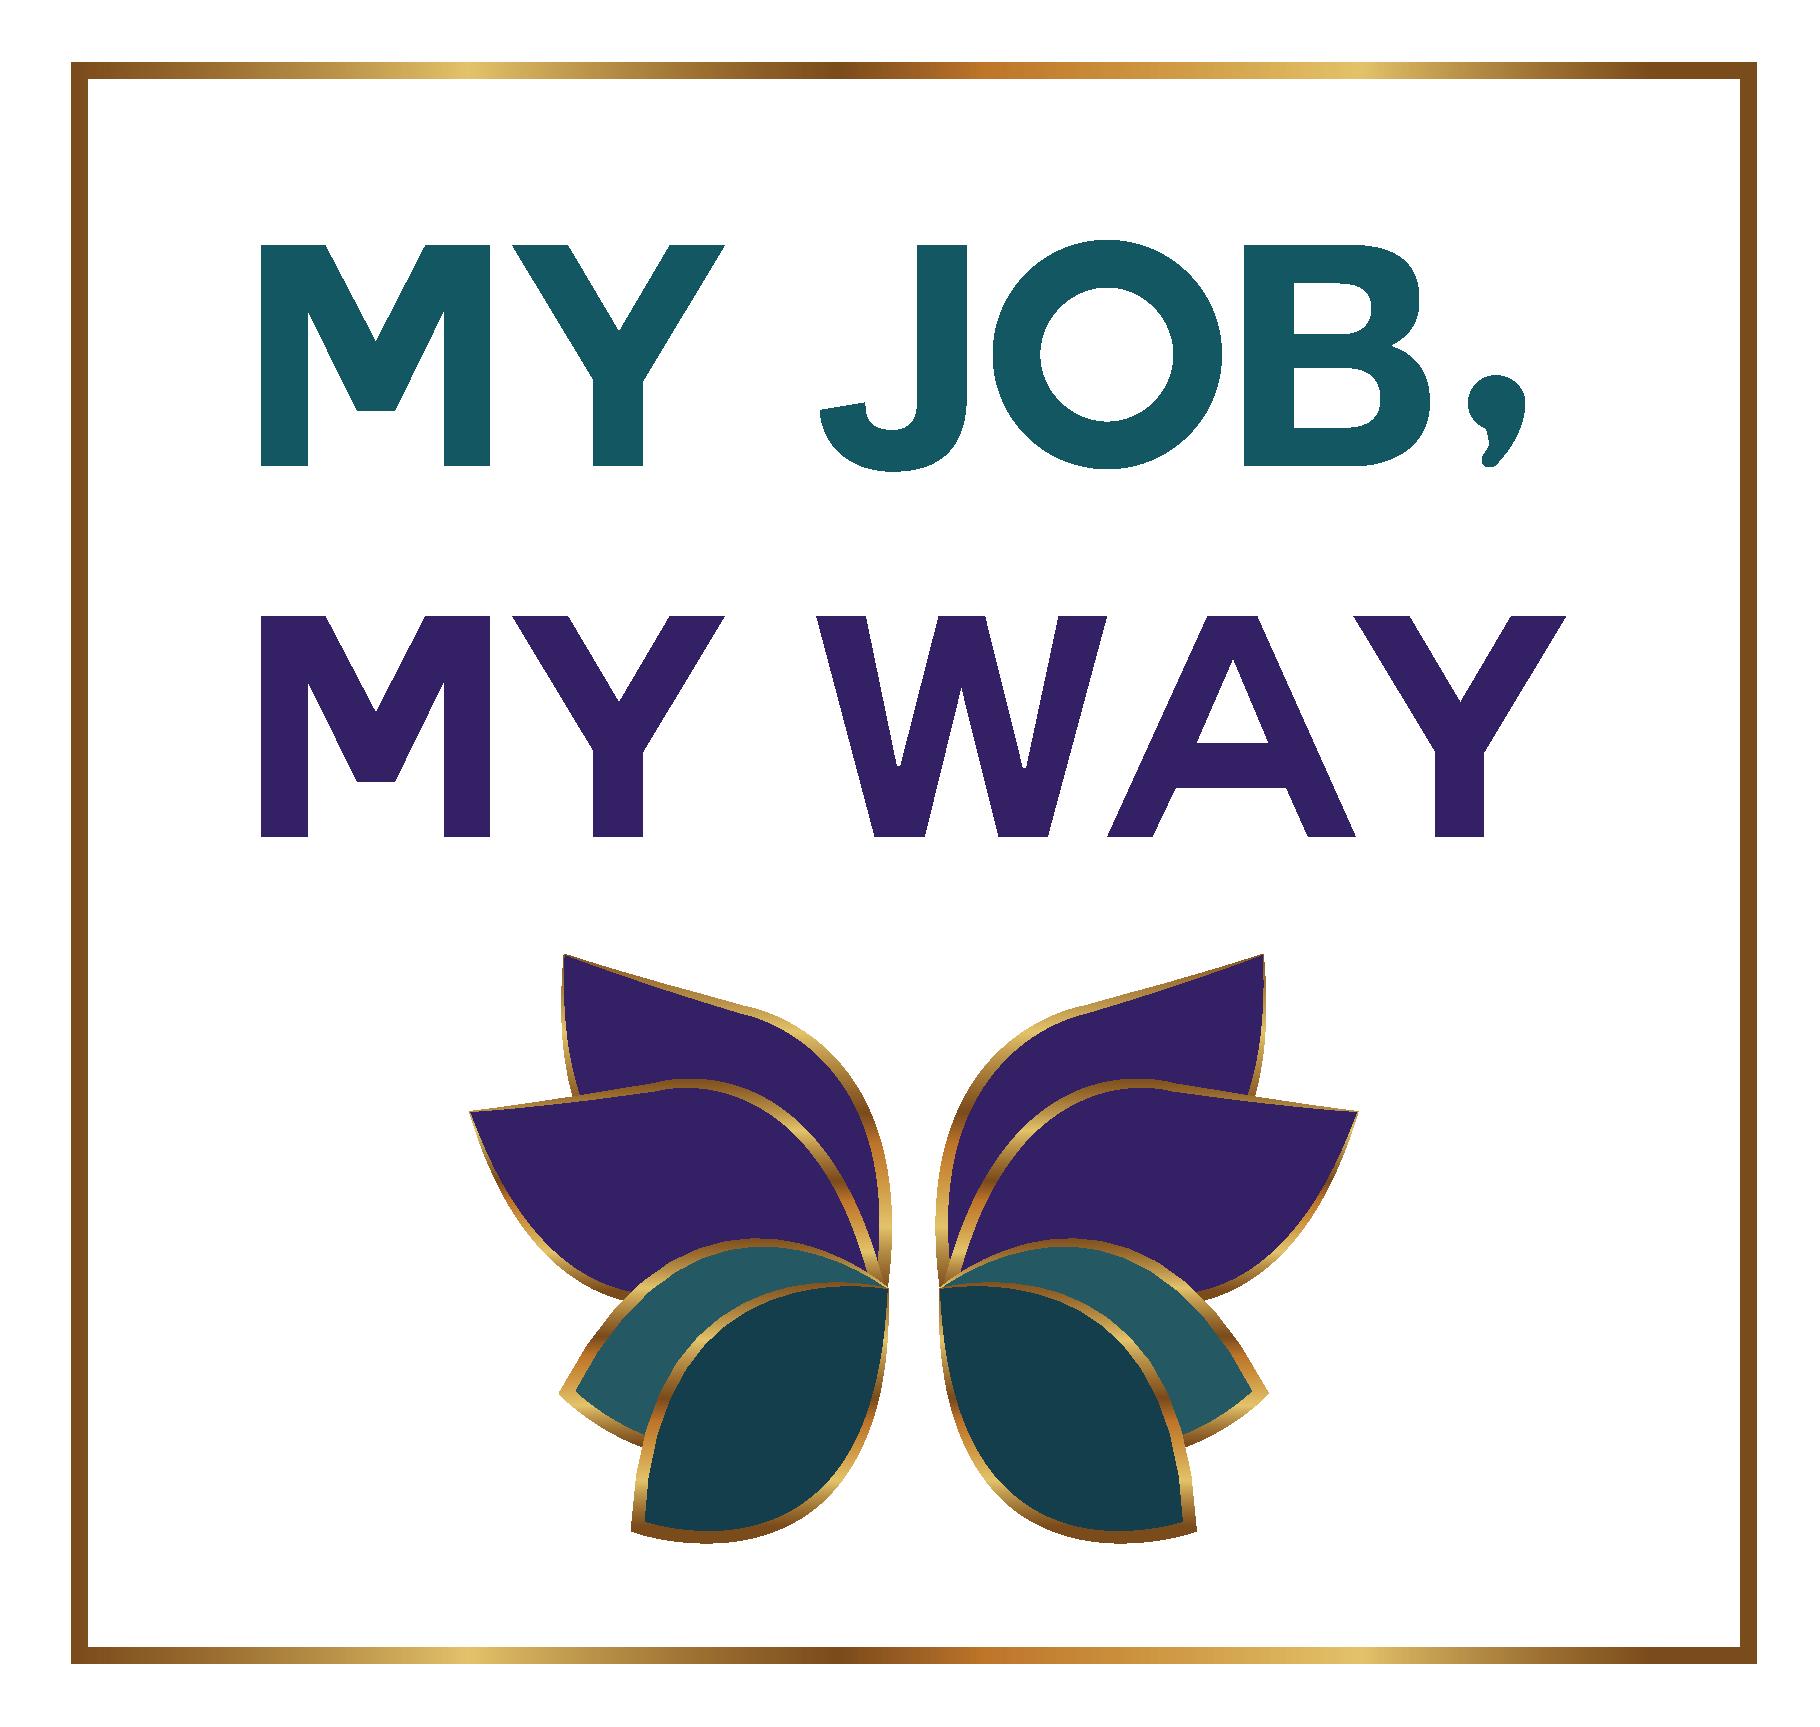 Centre MY JOB MY WAY